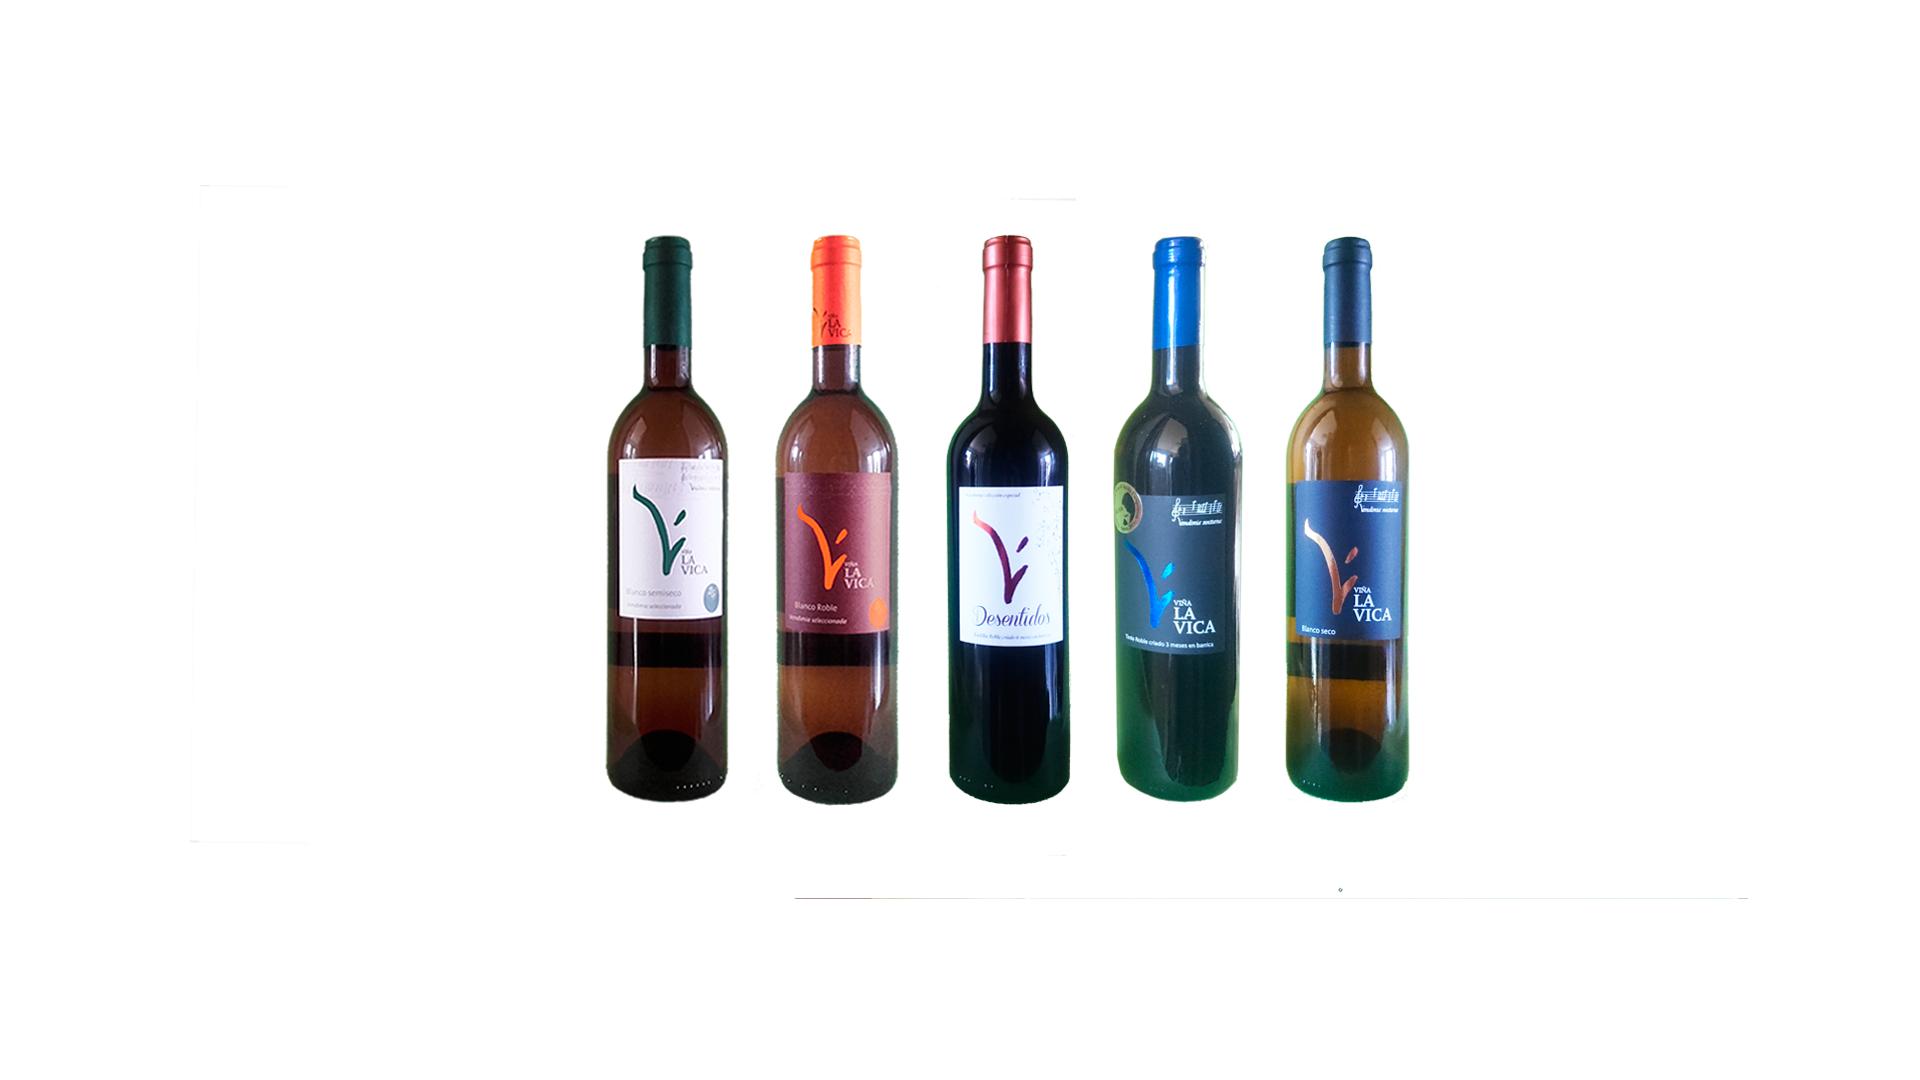 vinos-la-vica-5-botellas